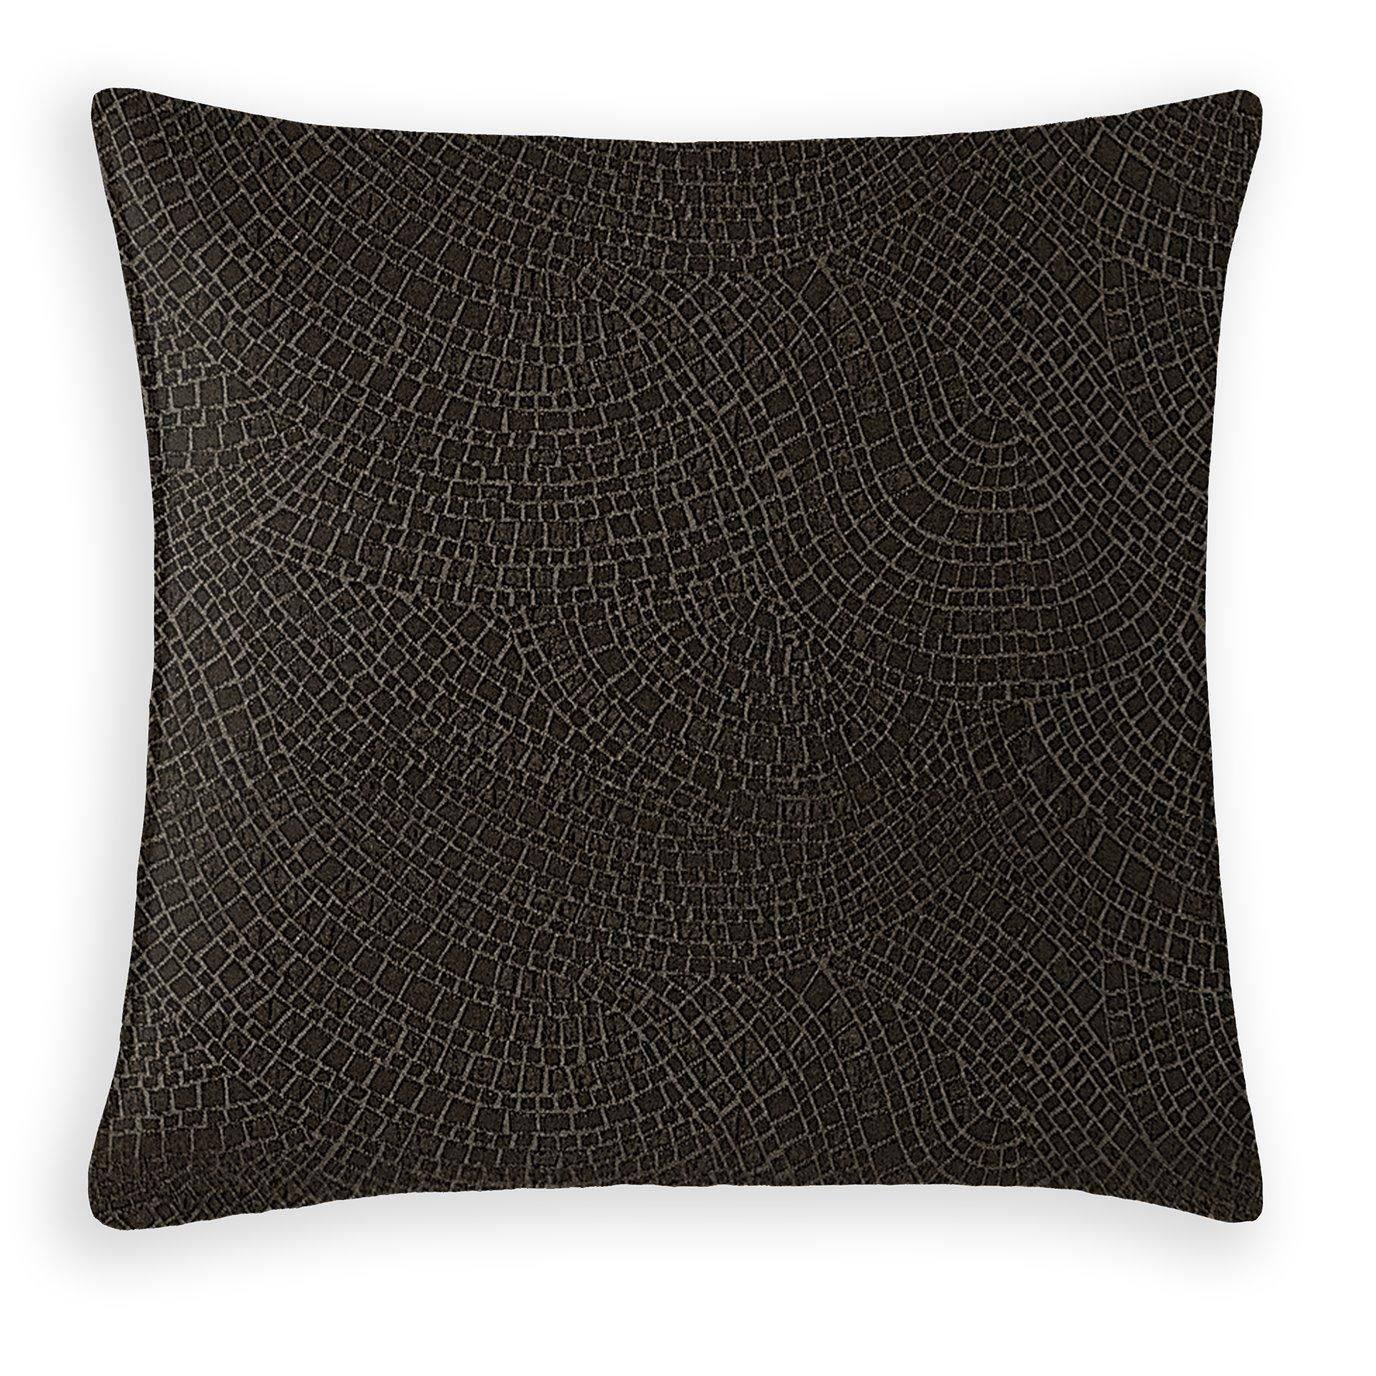 Hickory Lane Decorative Cushion - 24 Inch Square